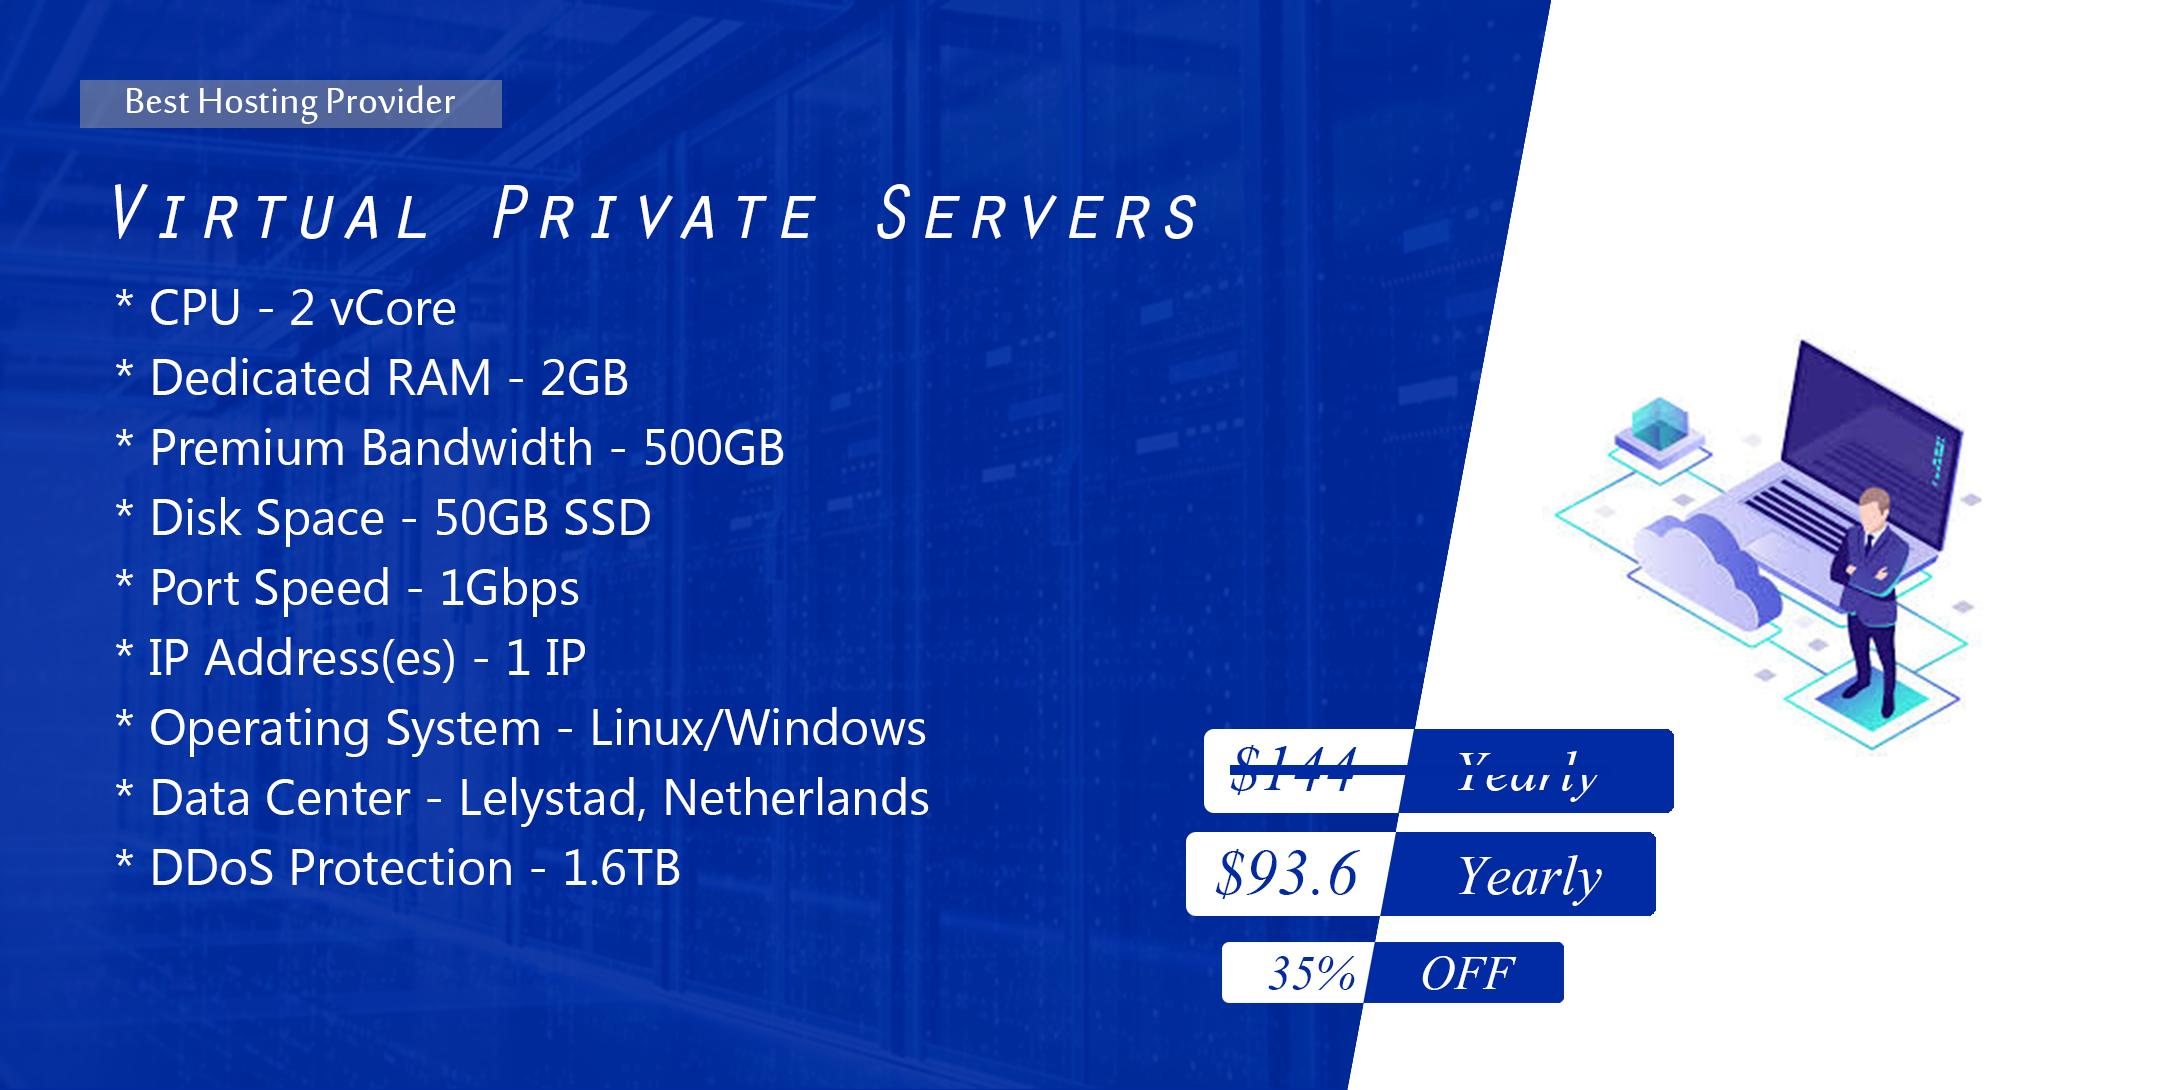 DDoS protected KVM VPS 2GB RAM 2 vCORE 50GB SSD,  Annual term